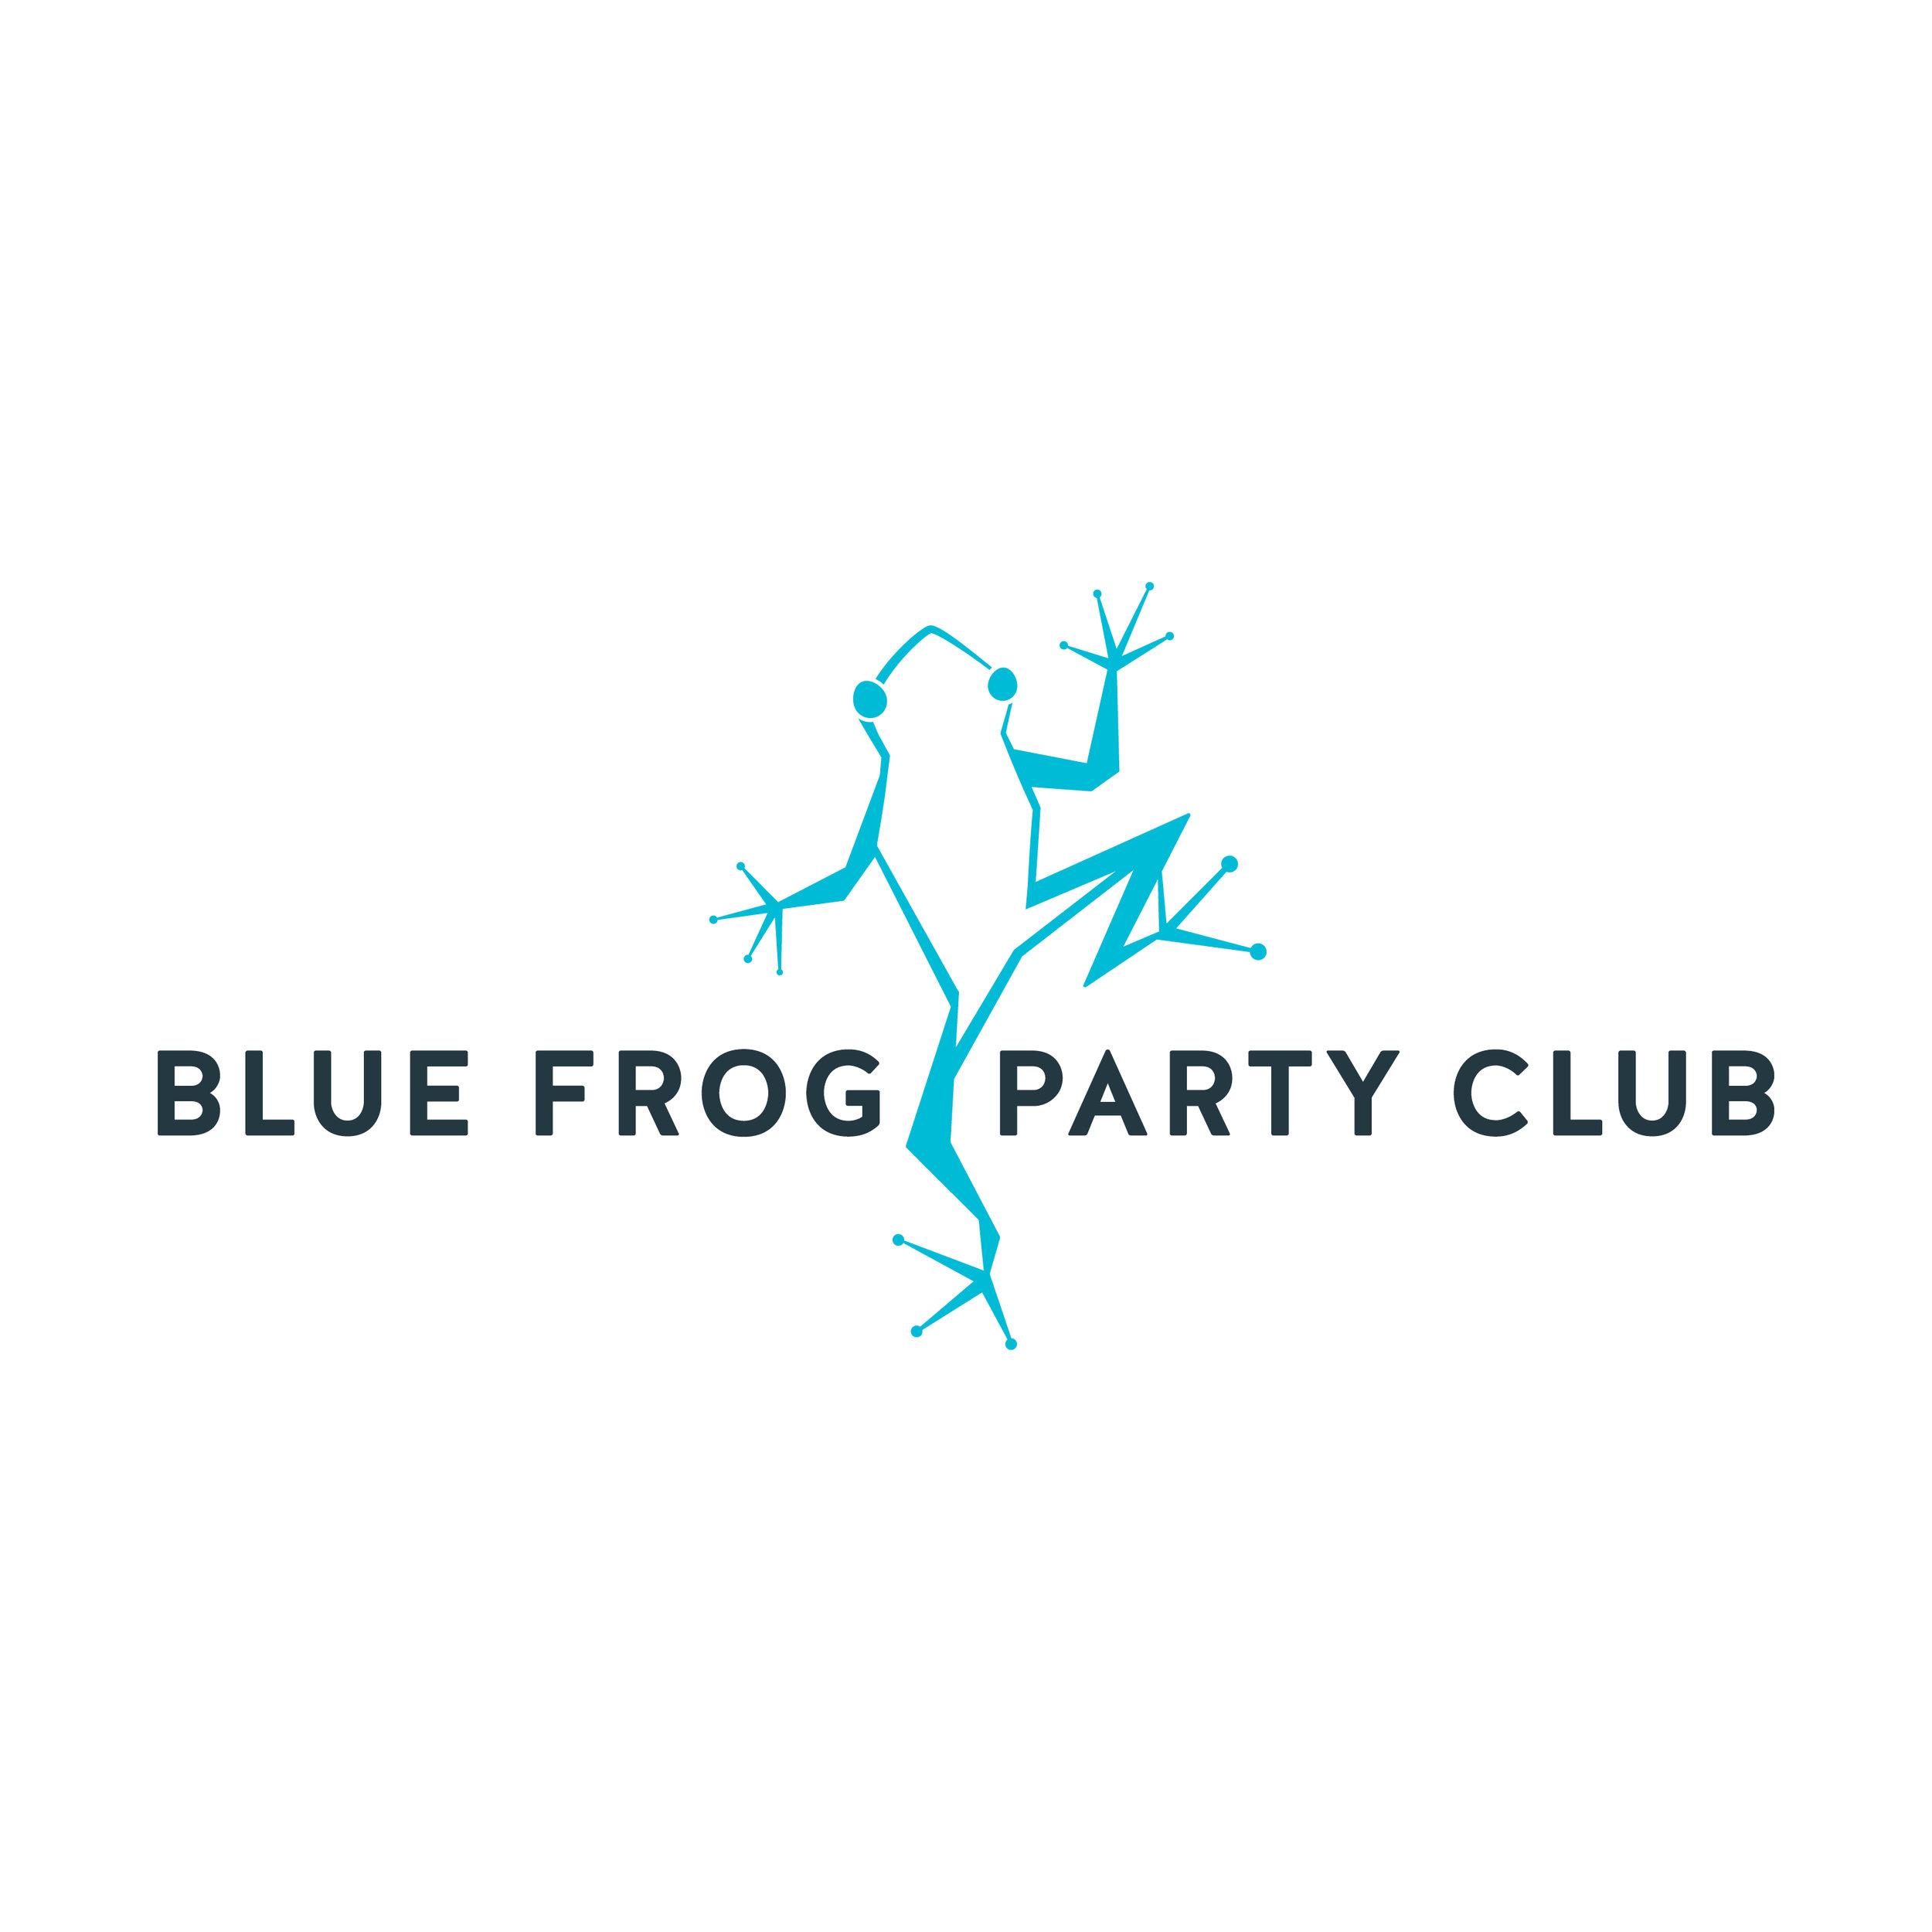 BlueFrogPartyClub.jpg